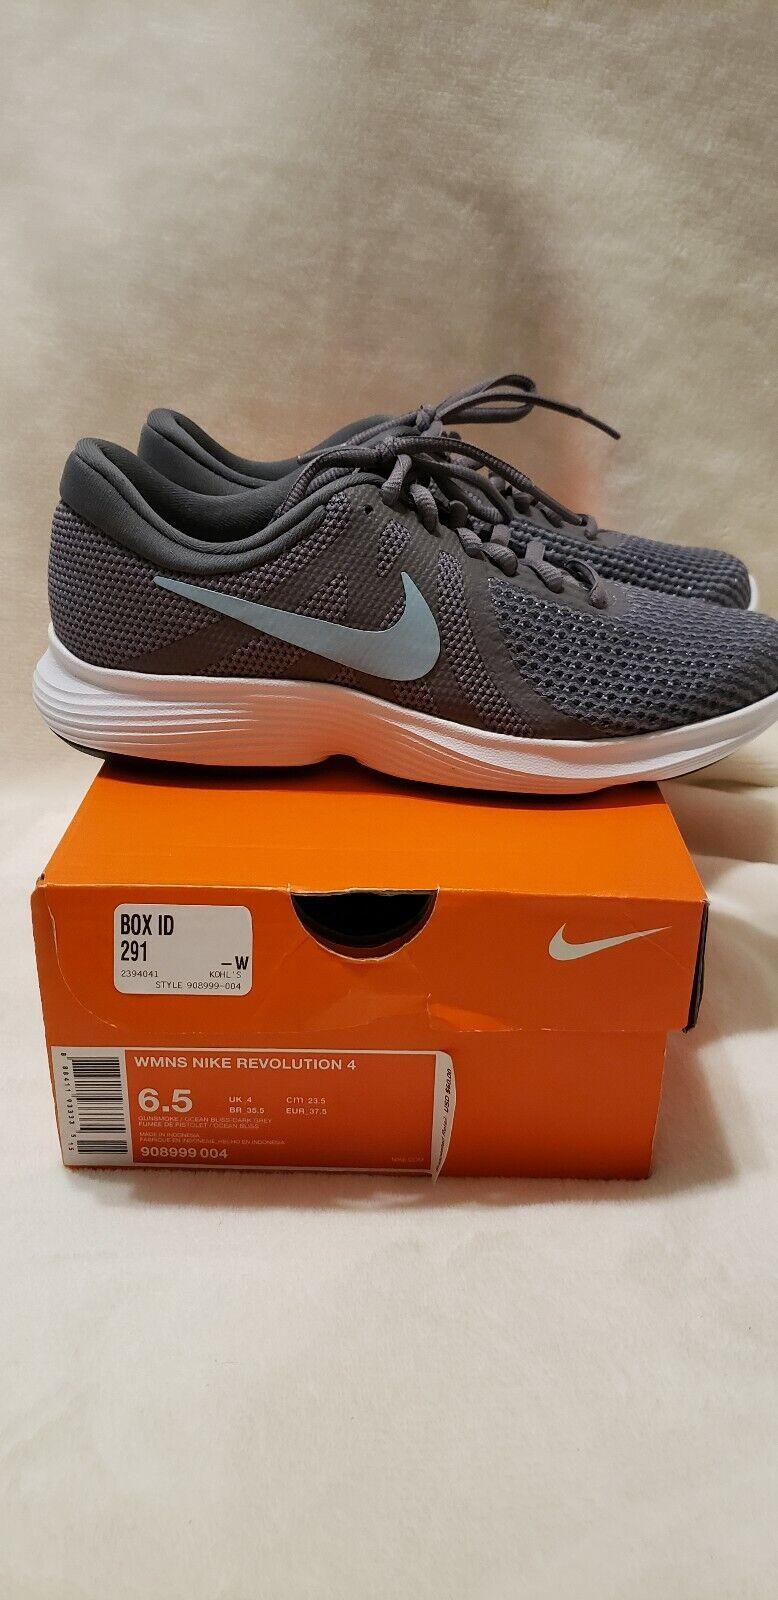 f7b1889ba8f2 Nike Nike Nike Women s Revolution 4 shoes (908999-004)6.5 606818 ...